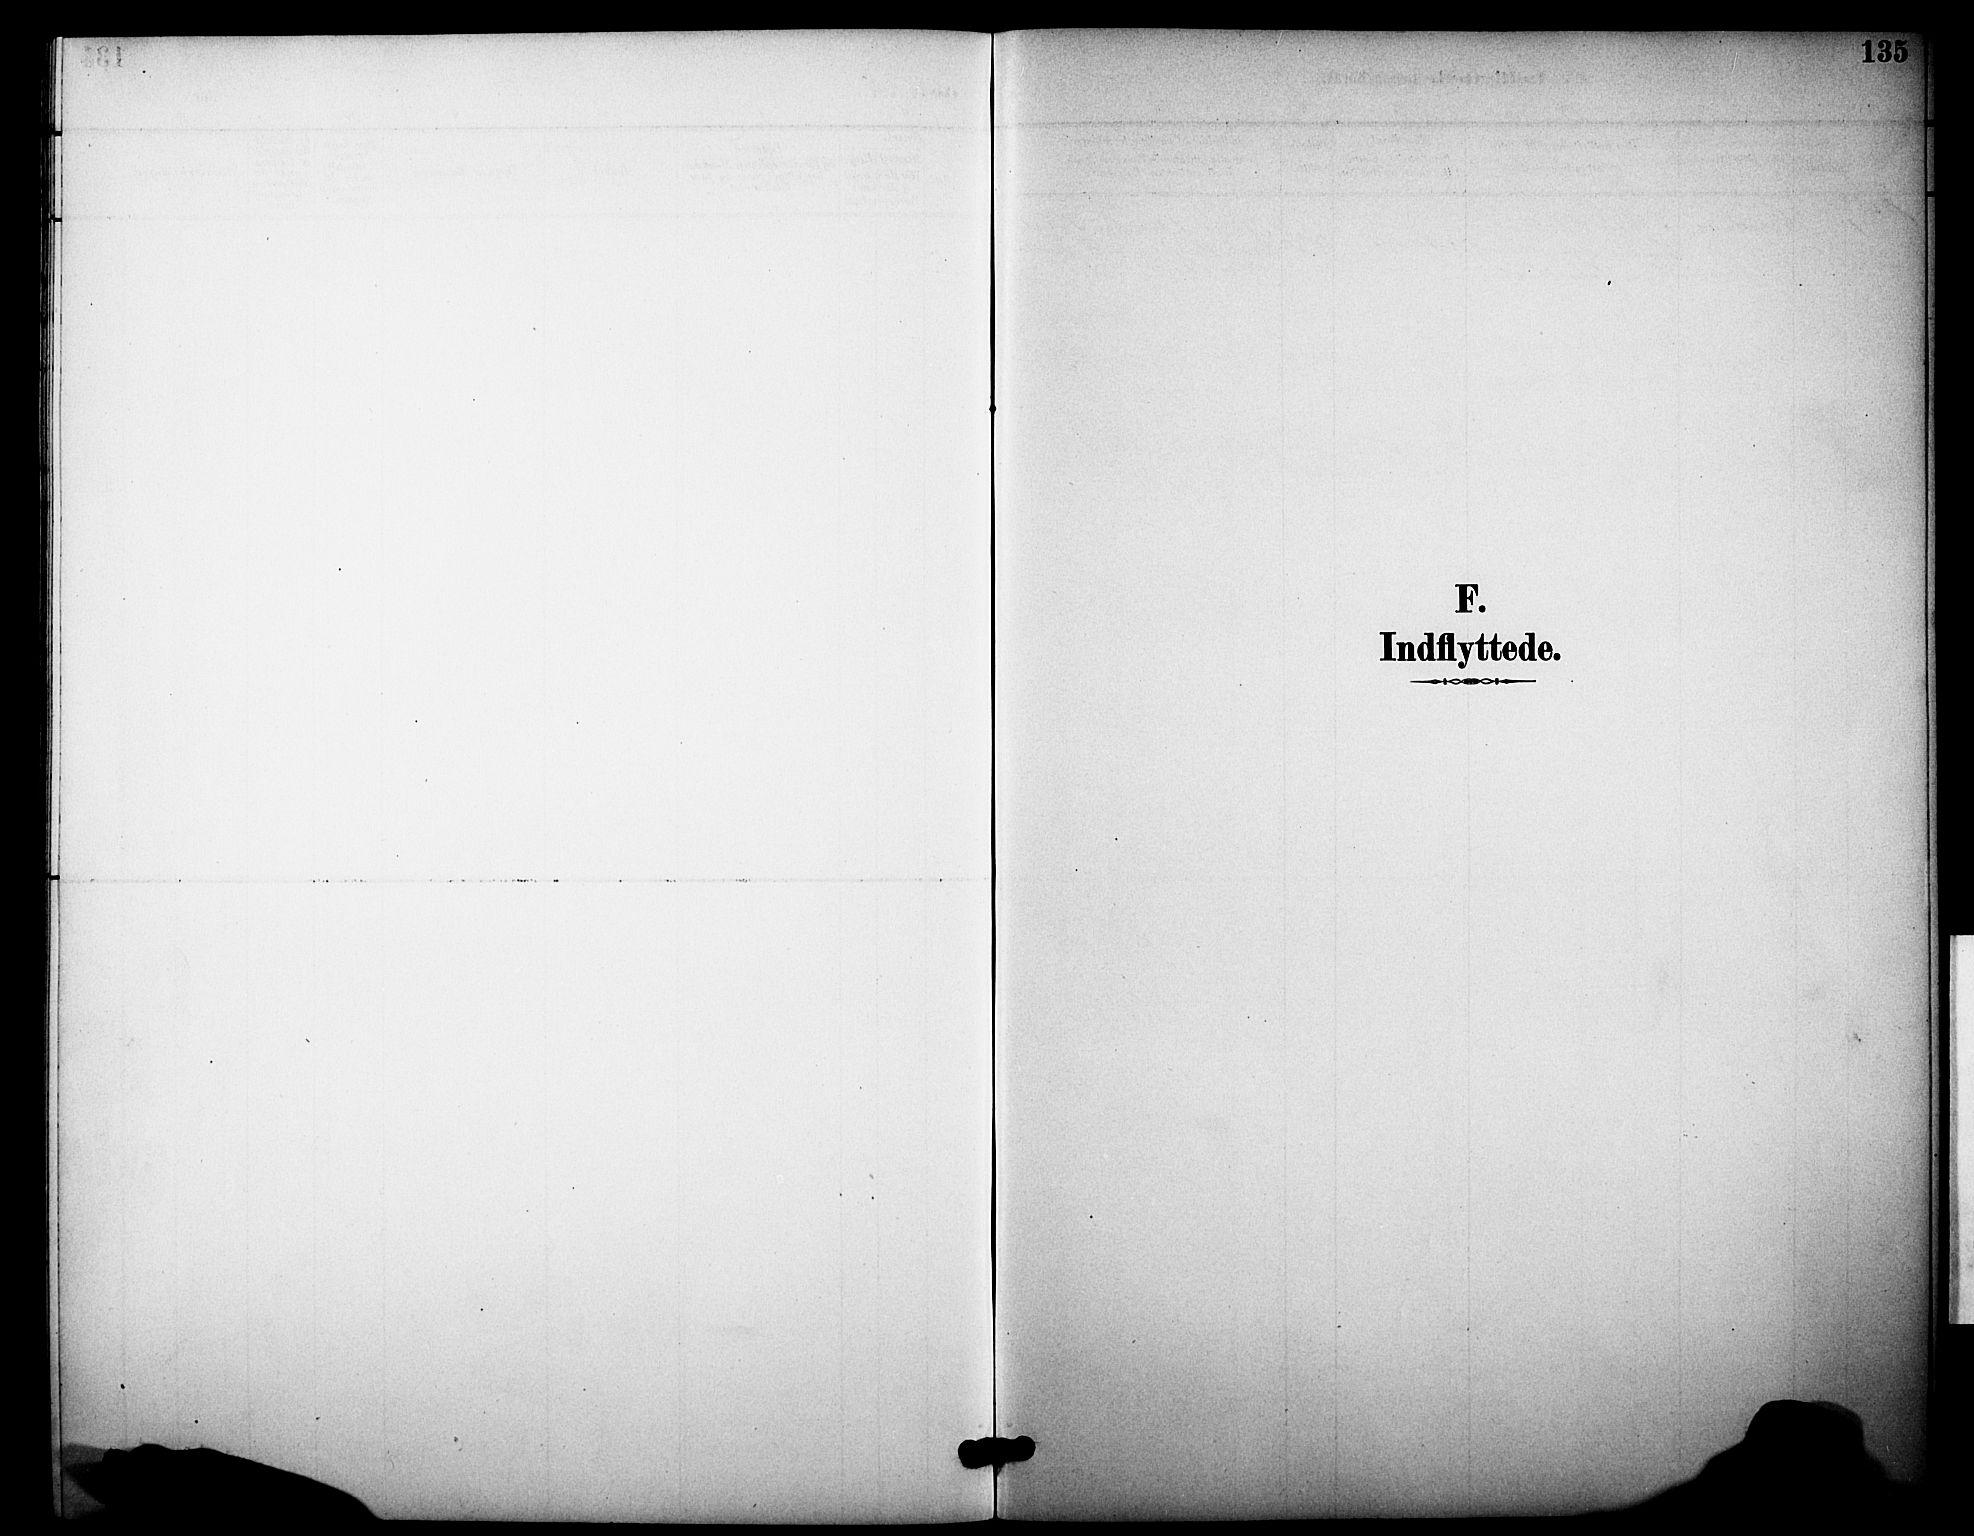 SAKO, Heddal kirkebøker, F/Fb/L0001: Ministerialbok nr. II 1, 1884-1910, s. 135